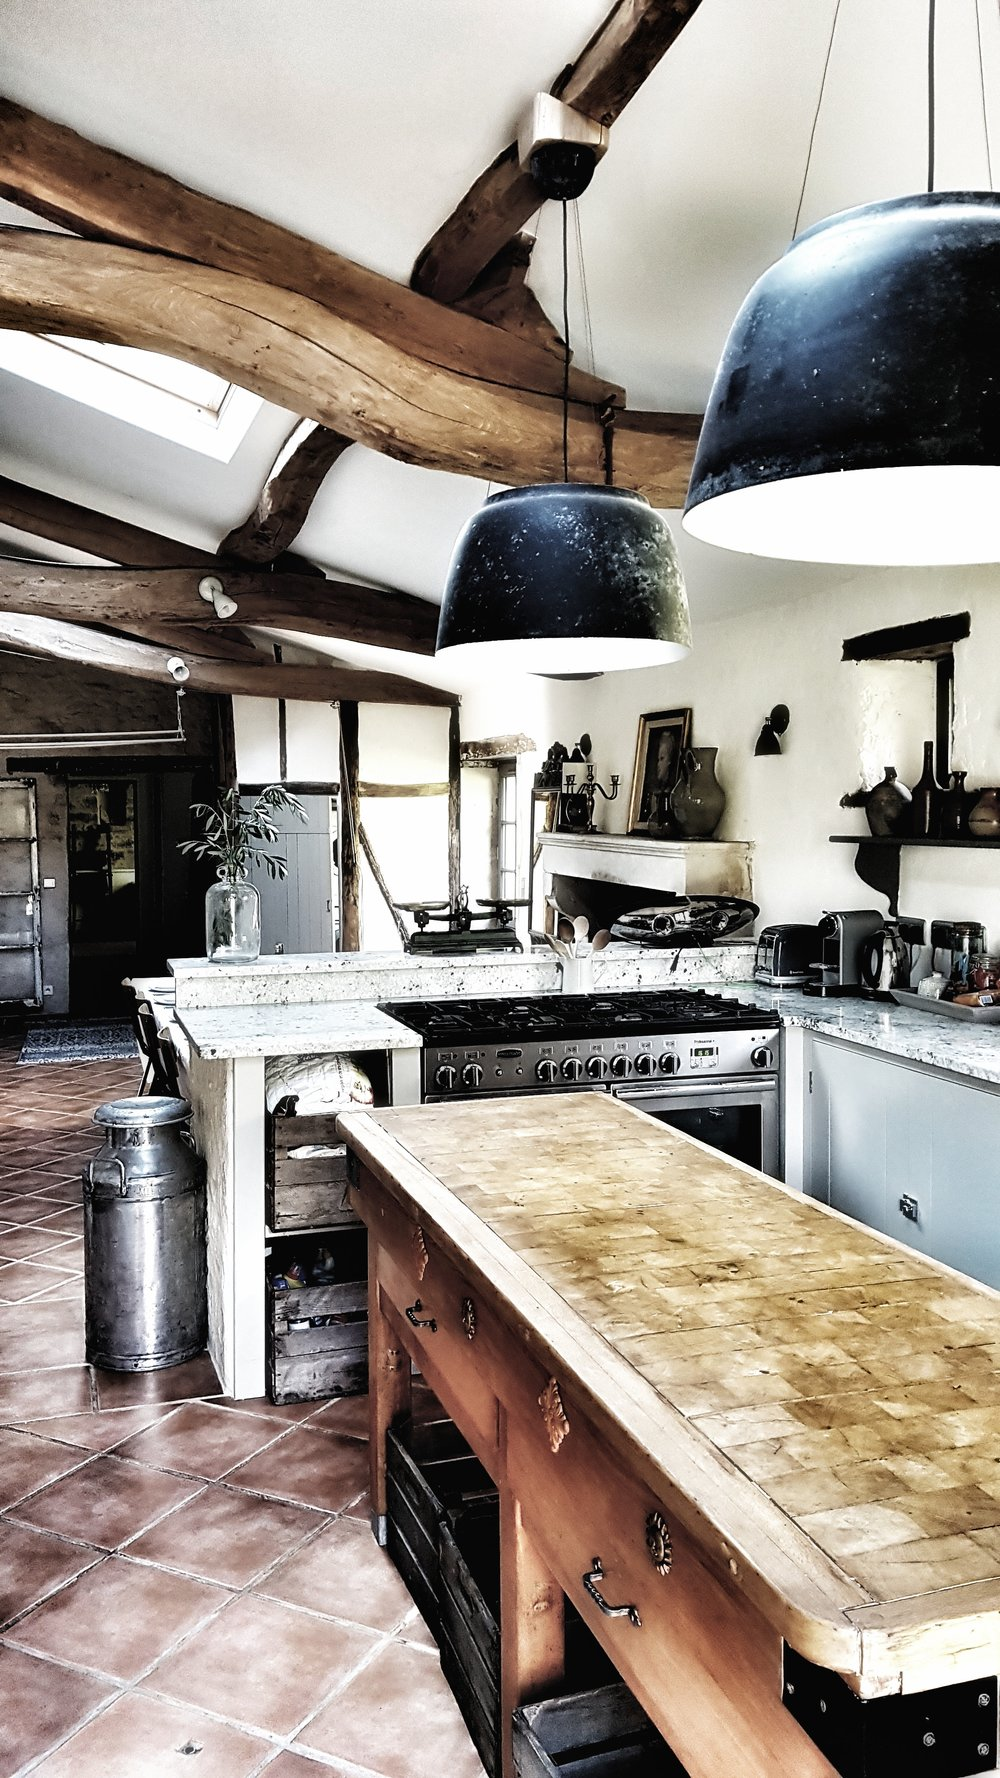 VCH kitchen 4.jpeg